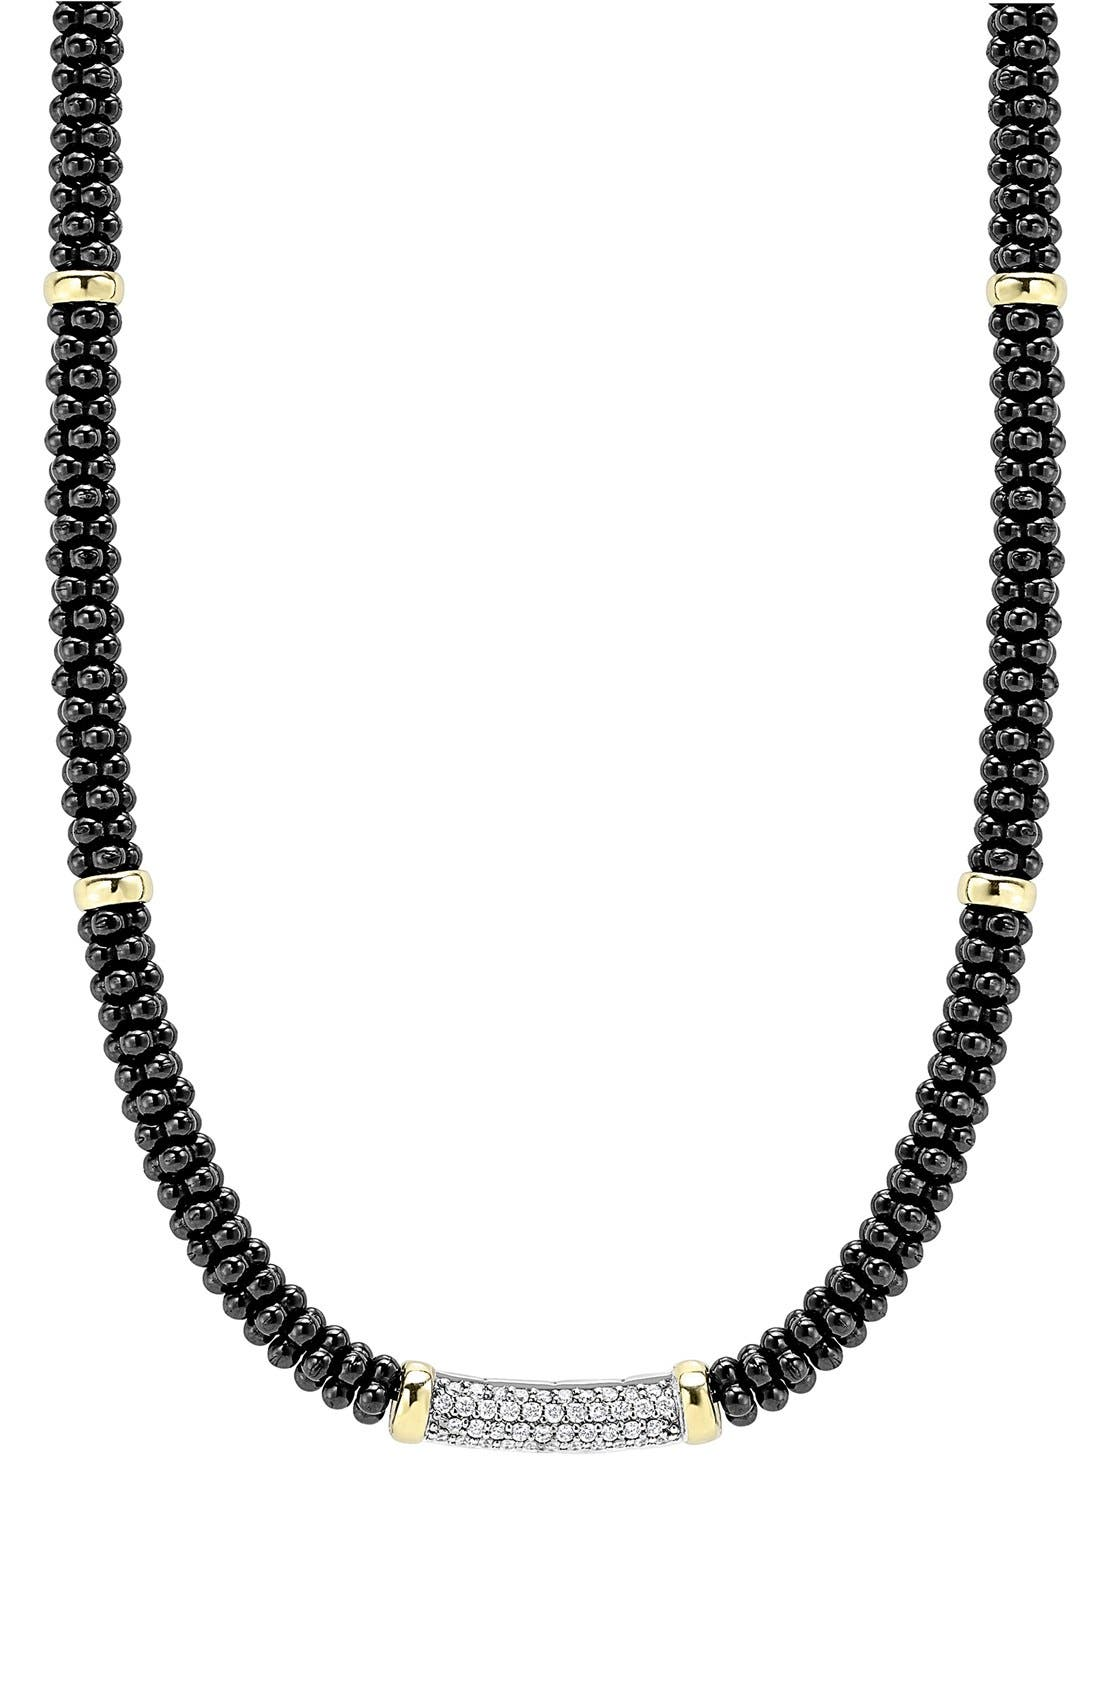 Alternate Image 1 Selected - LAGOS 'Black Caviar' 5mm Beaded DiamondBar Necklace